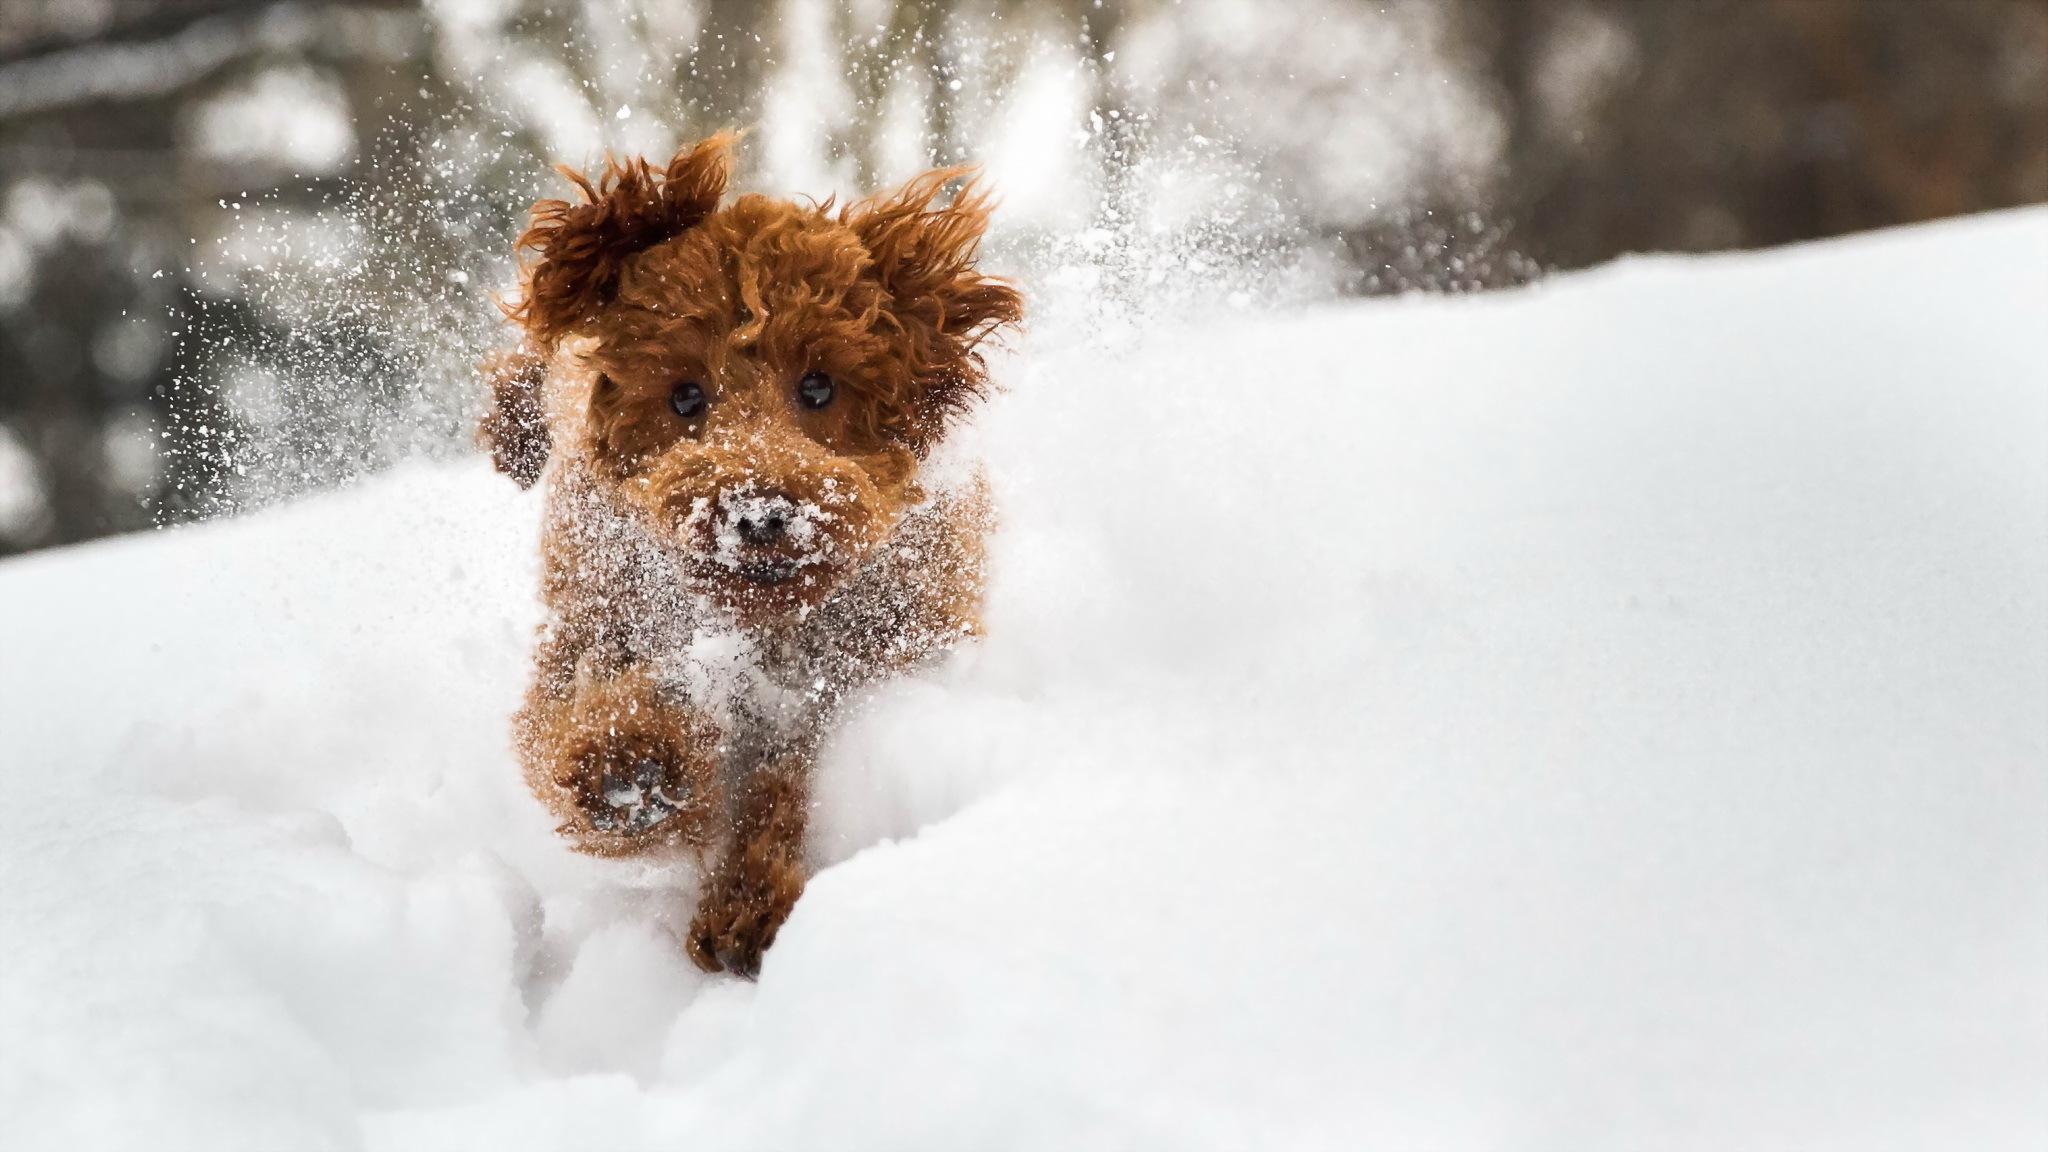 Прикольные картинки коты собачки зима снег, картинки